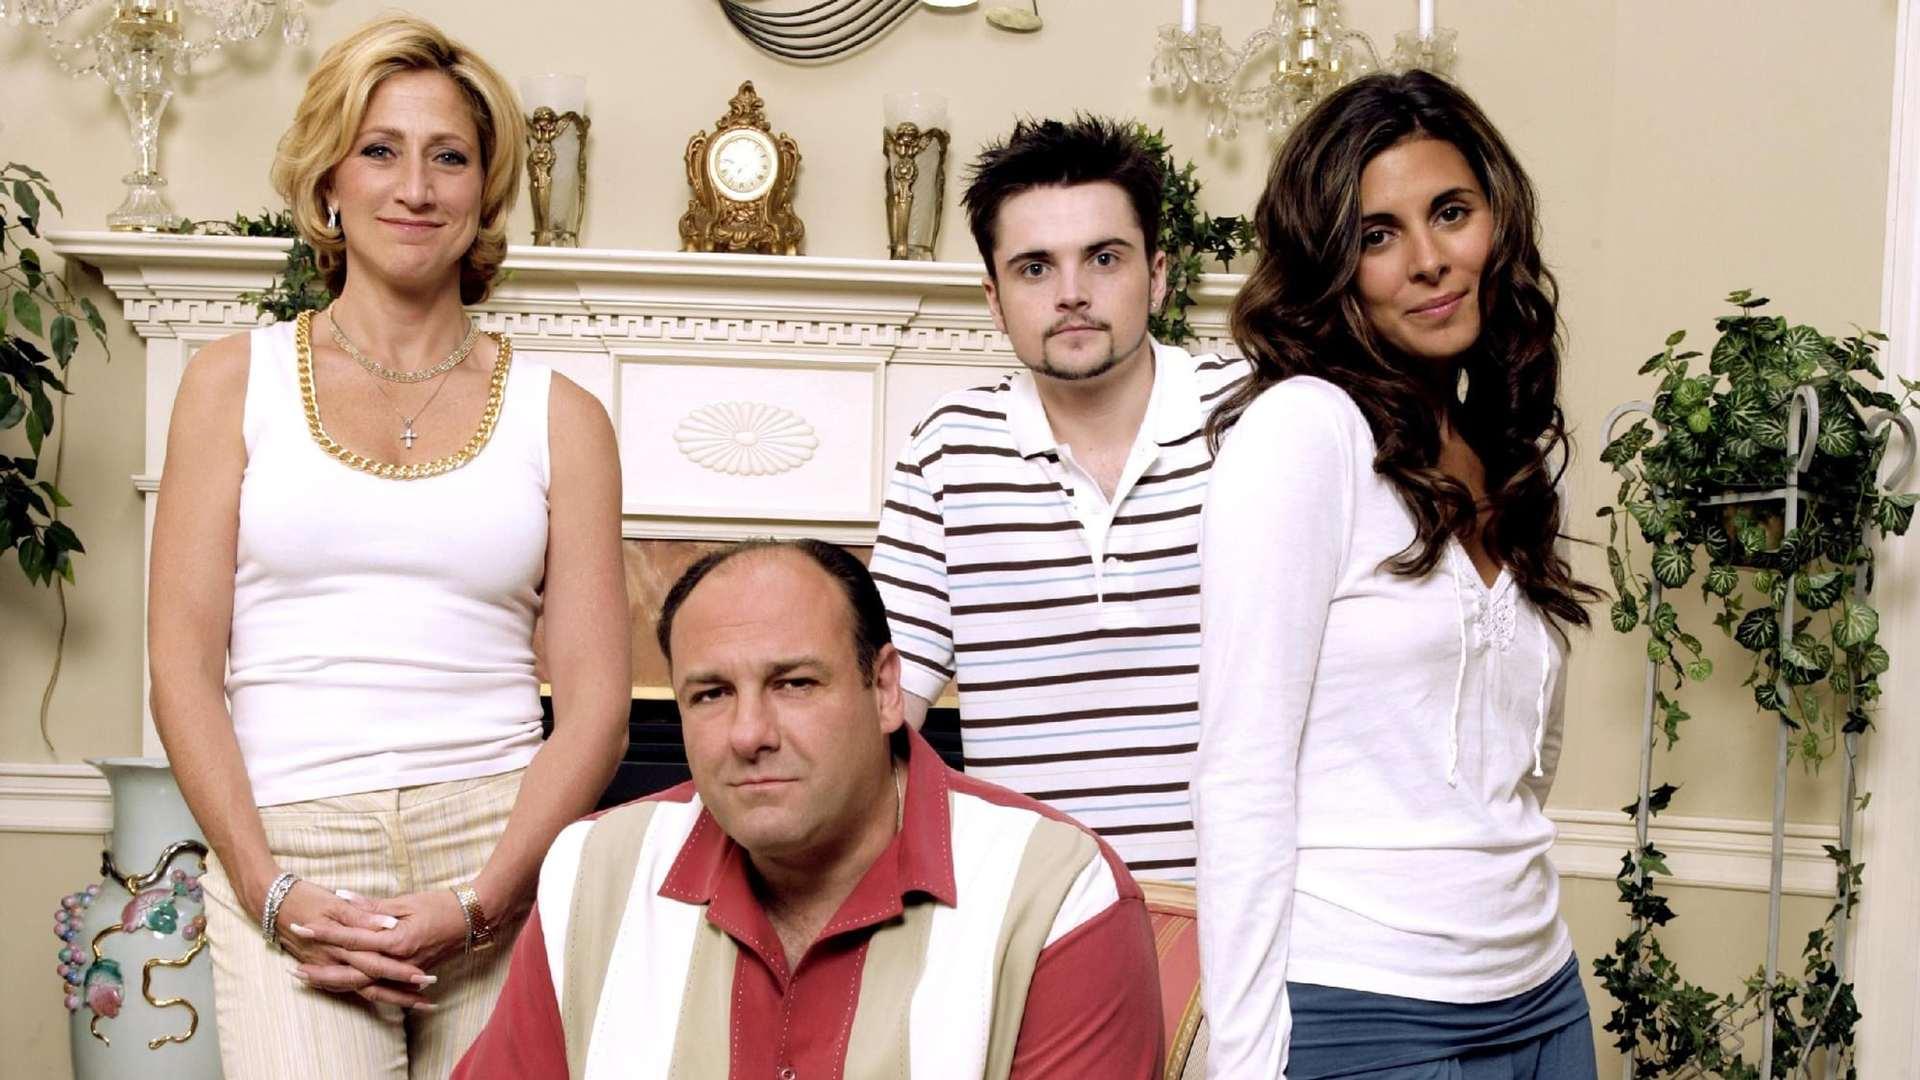 Кадры из фильма Клан Сопрано The Sopranos 1999